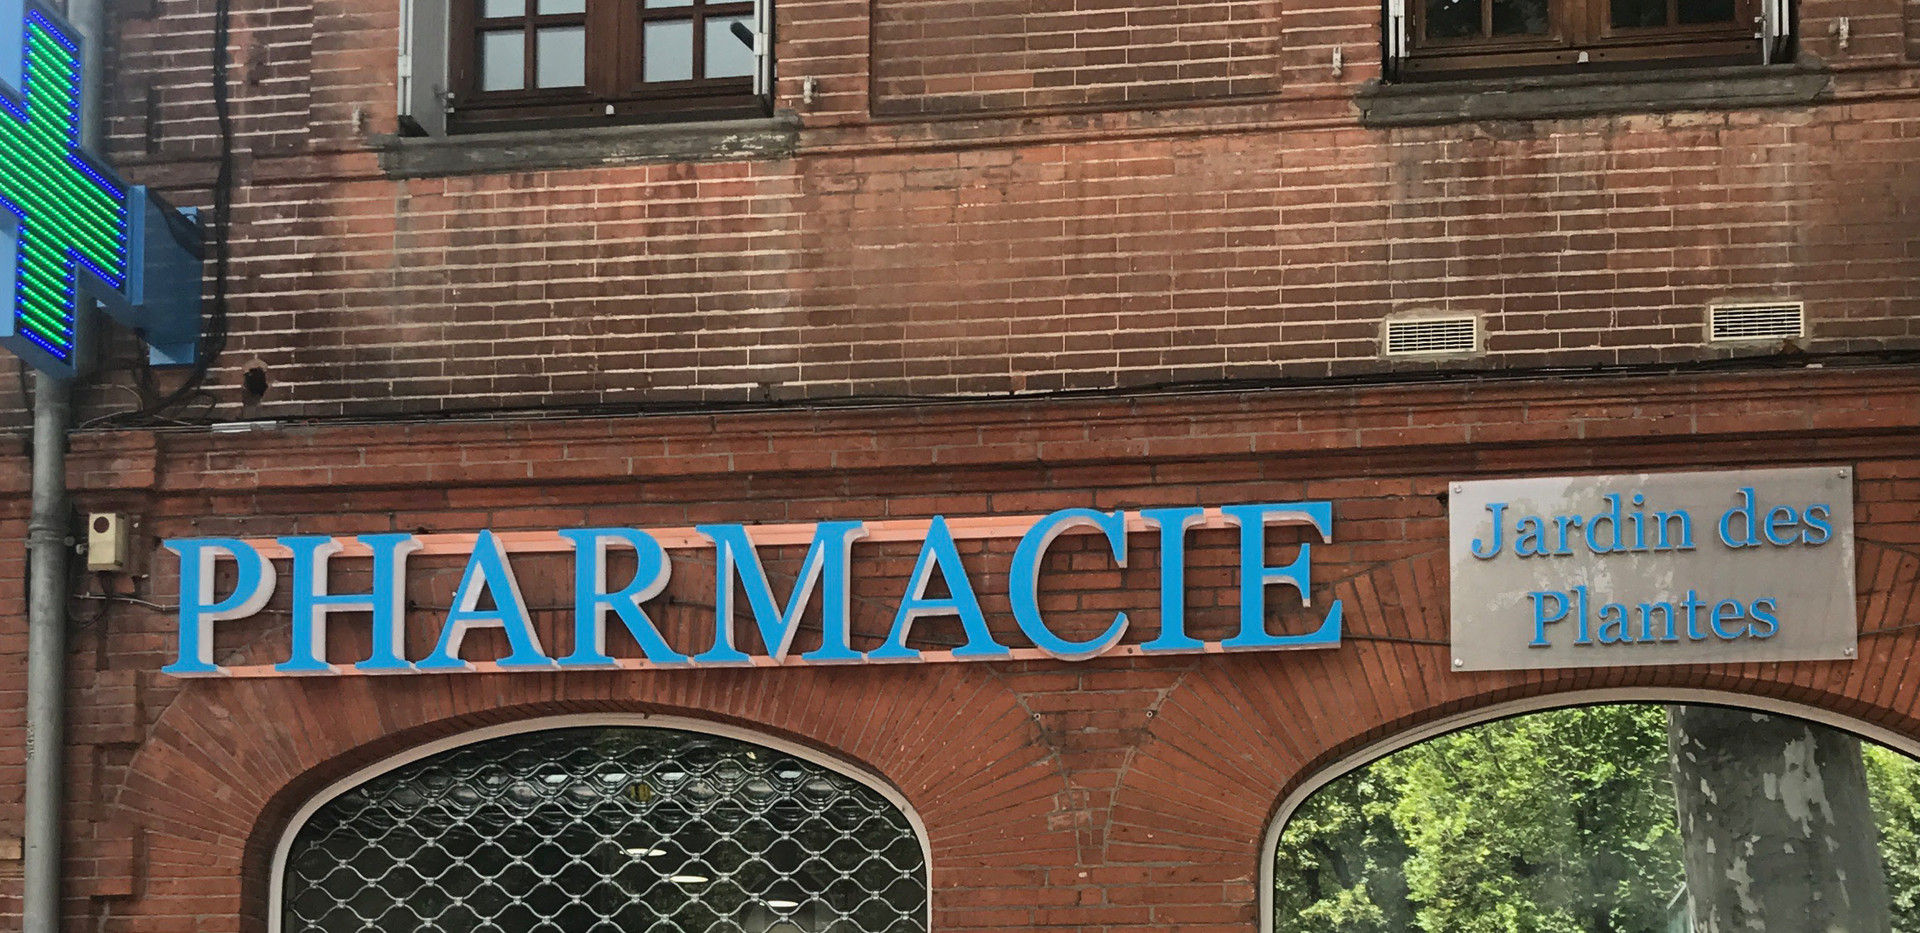 Enseigne Led pharmacie Jardin des plante